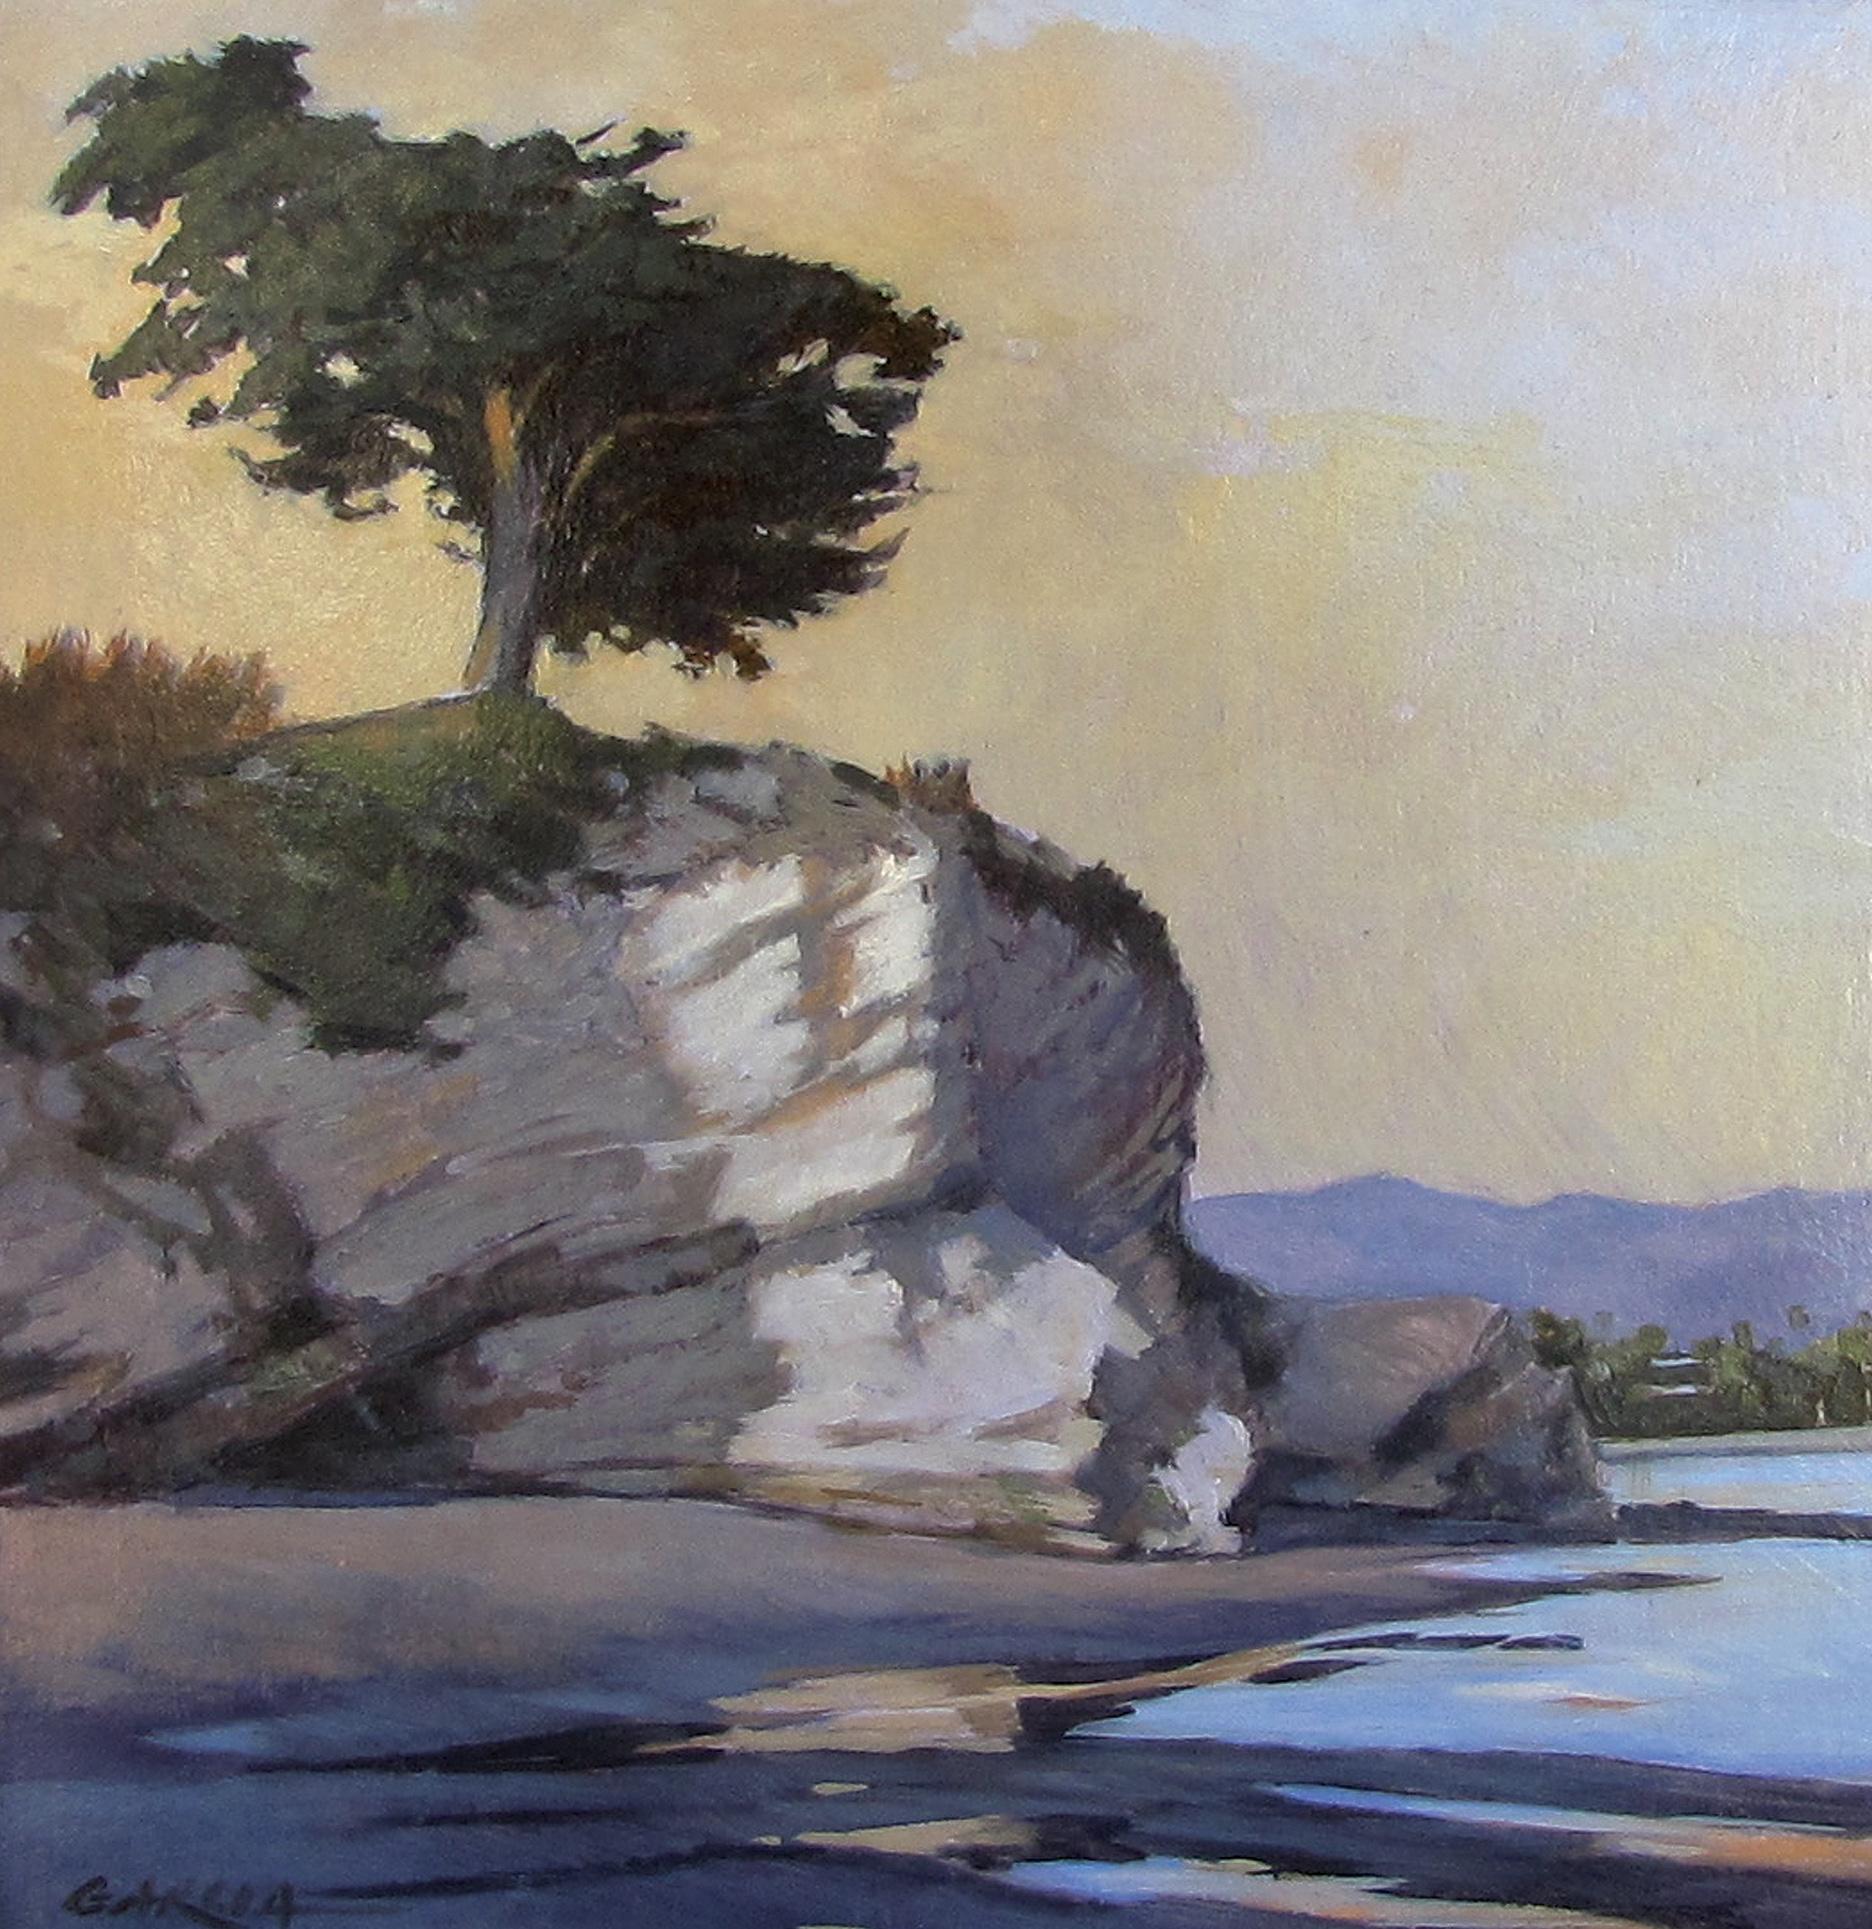 Low Tide at Leadbetter, 8 x 8, oil on board. Contact  Tartaglia Fine Art